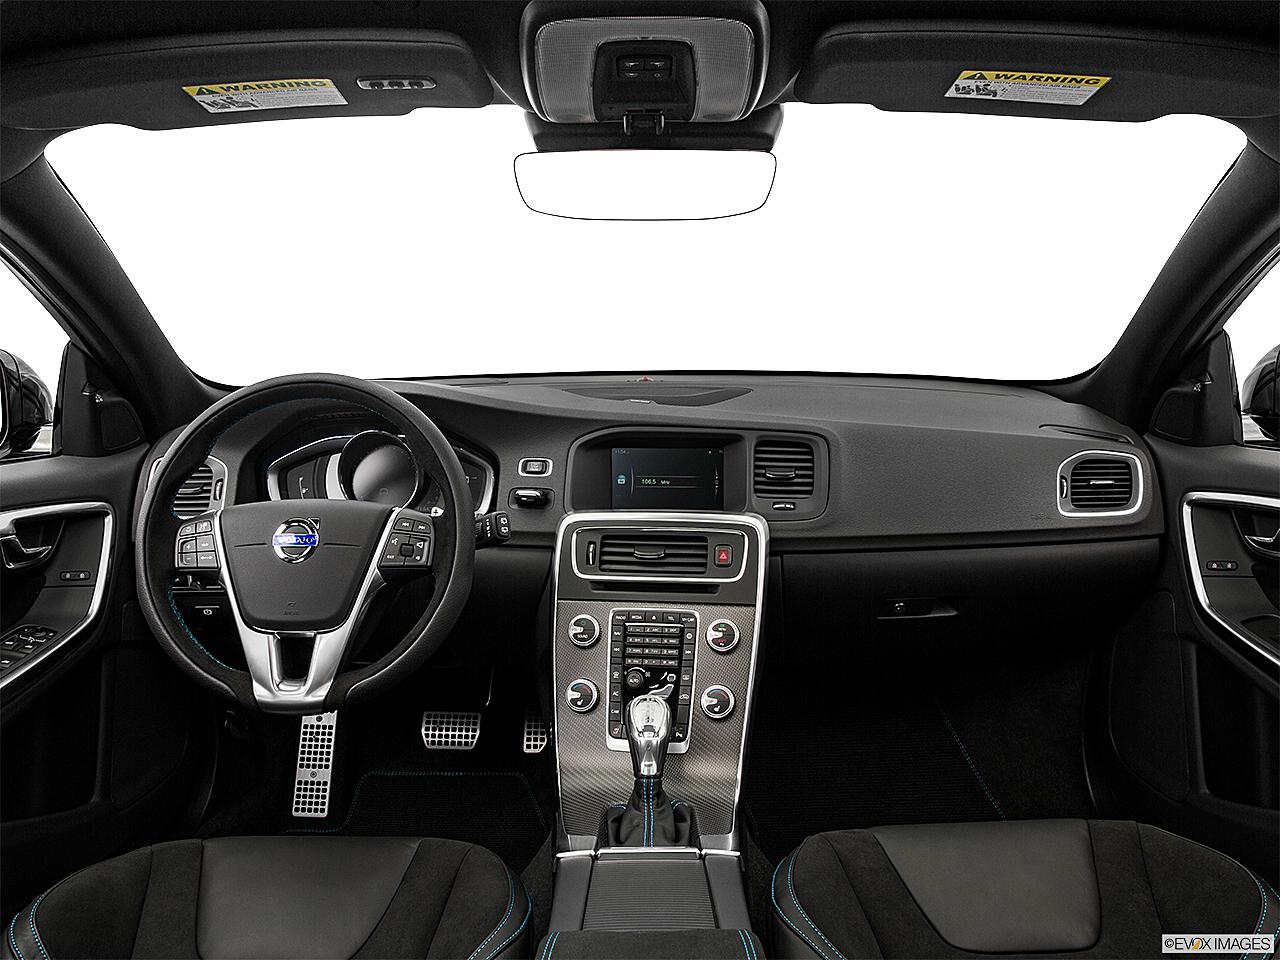 2016 Volvo V60 T5 Drive E Fwd Premier Centered Wide Dash Shot